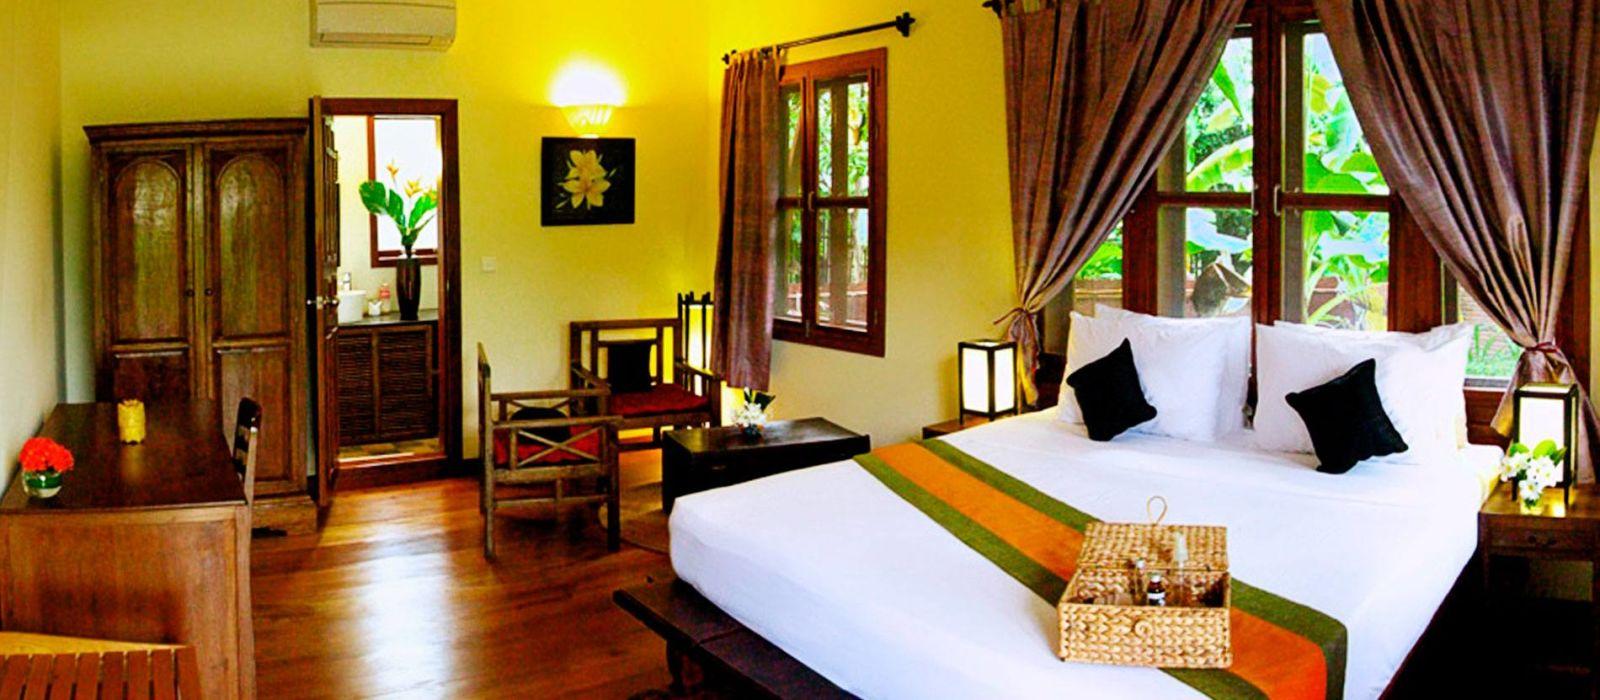 Hotel Maisons Wat Kor Kambodscha